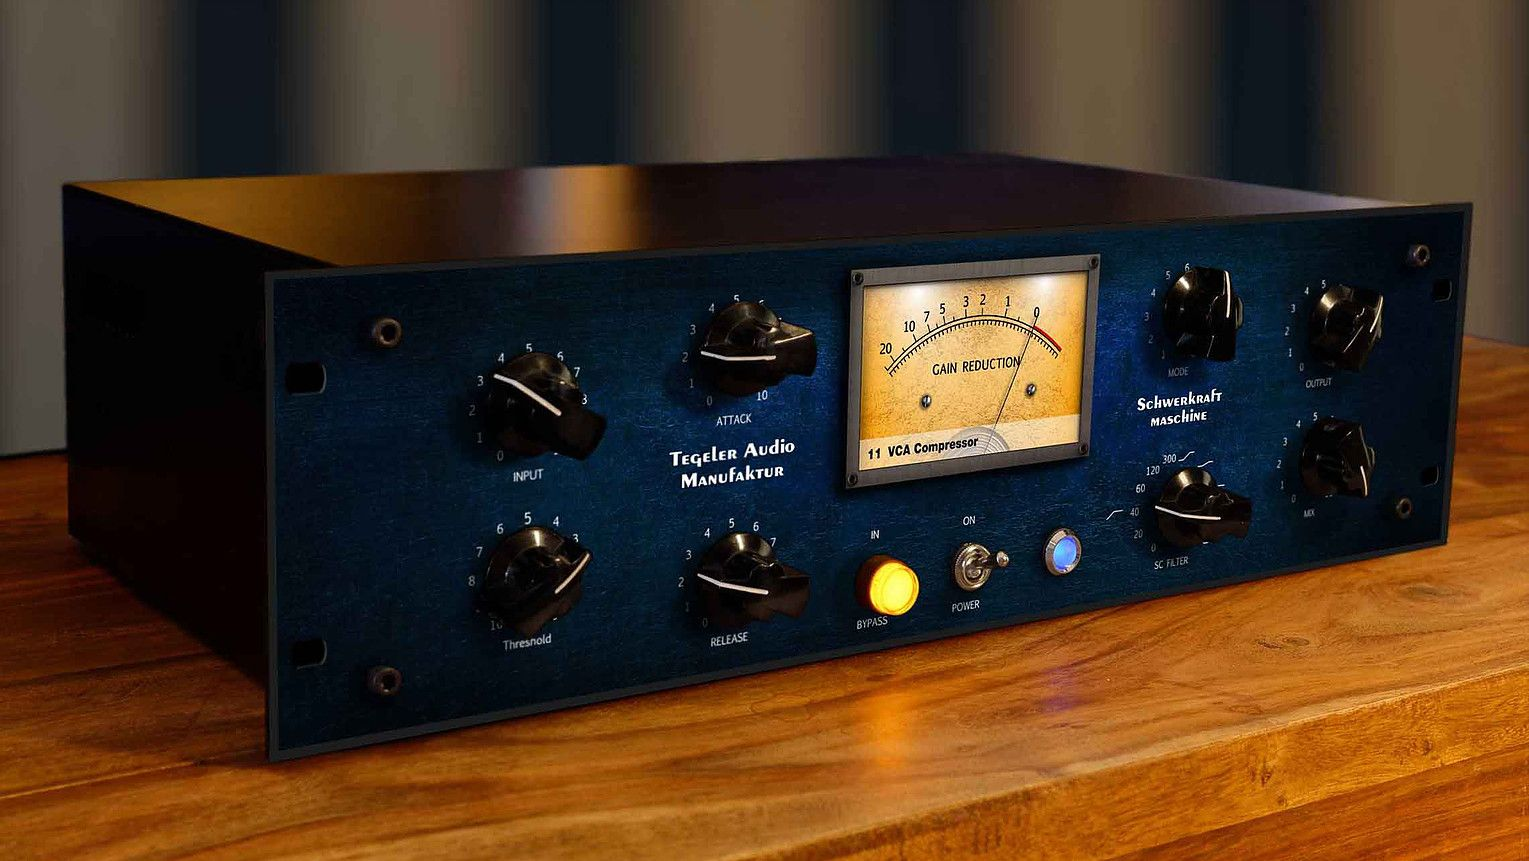 Tegeler Audio Schwerkraftmaschine stereo compressor.